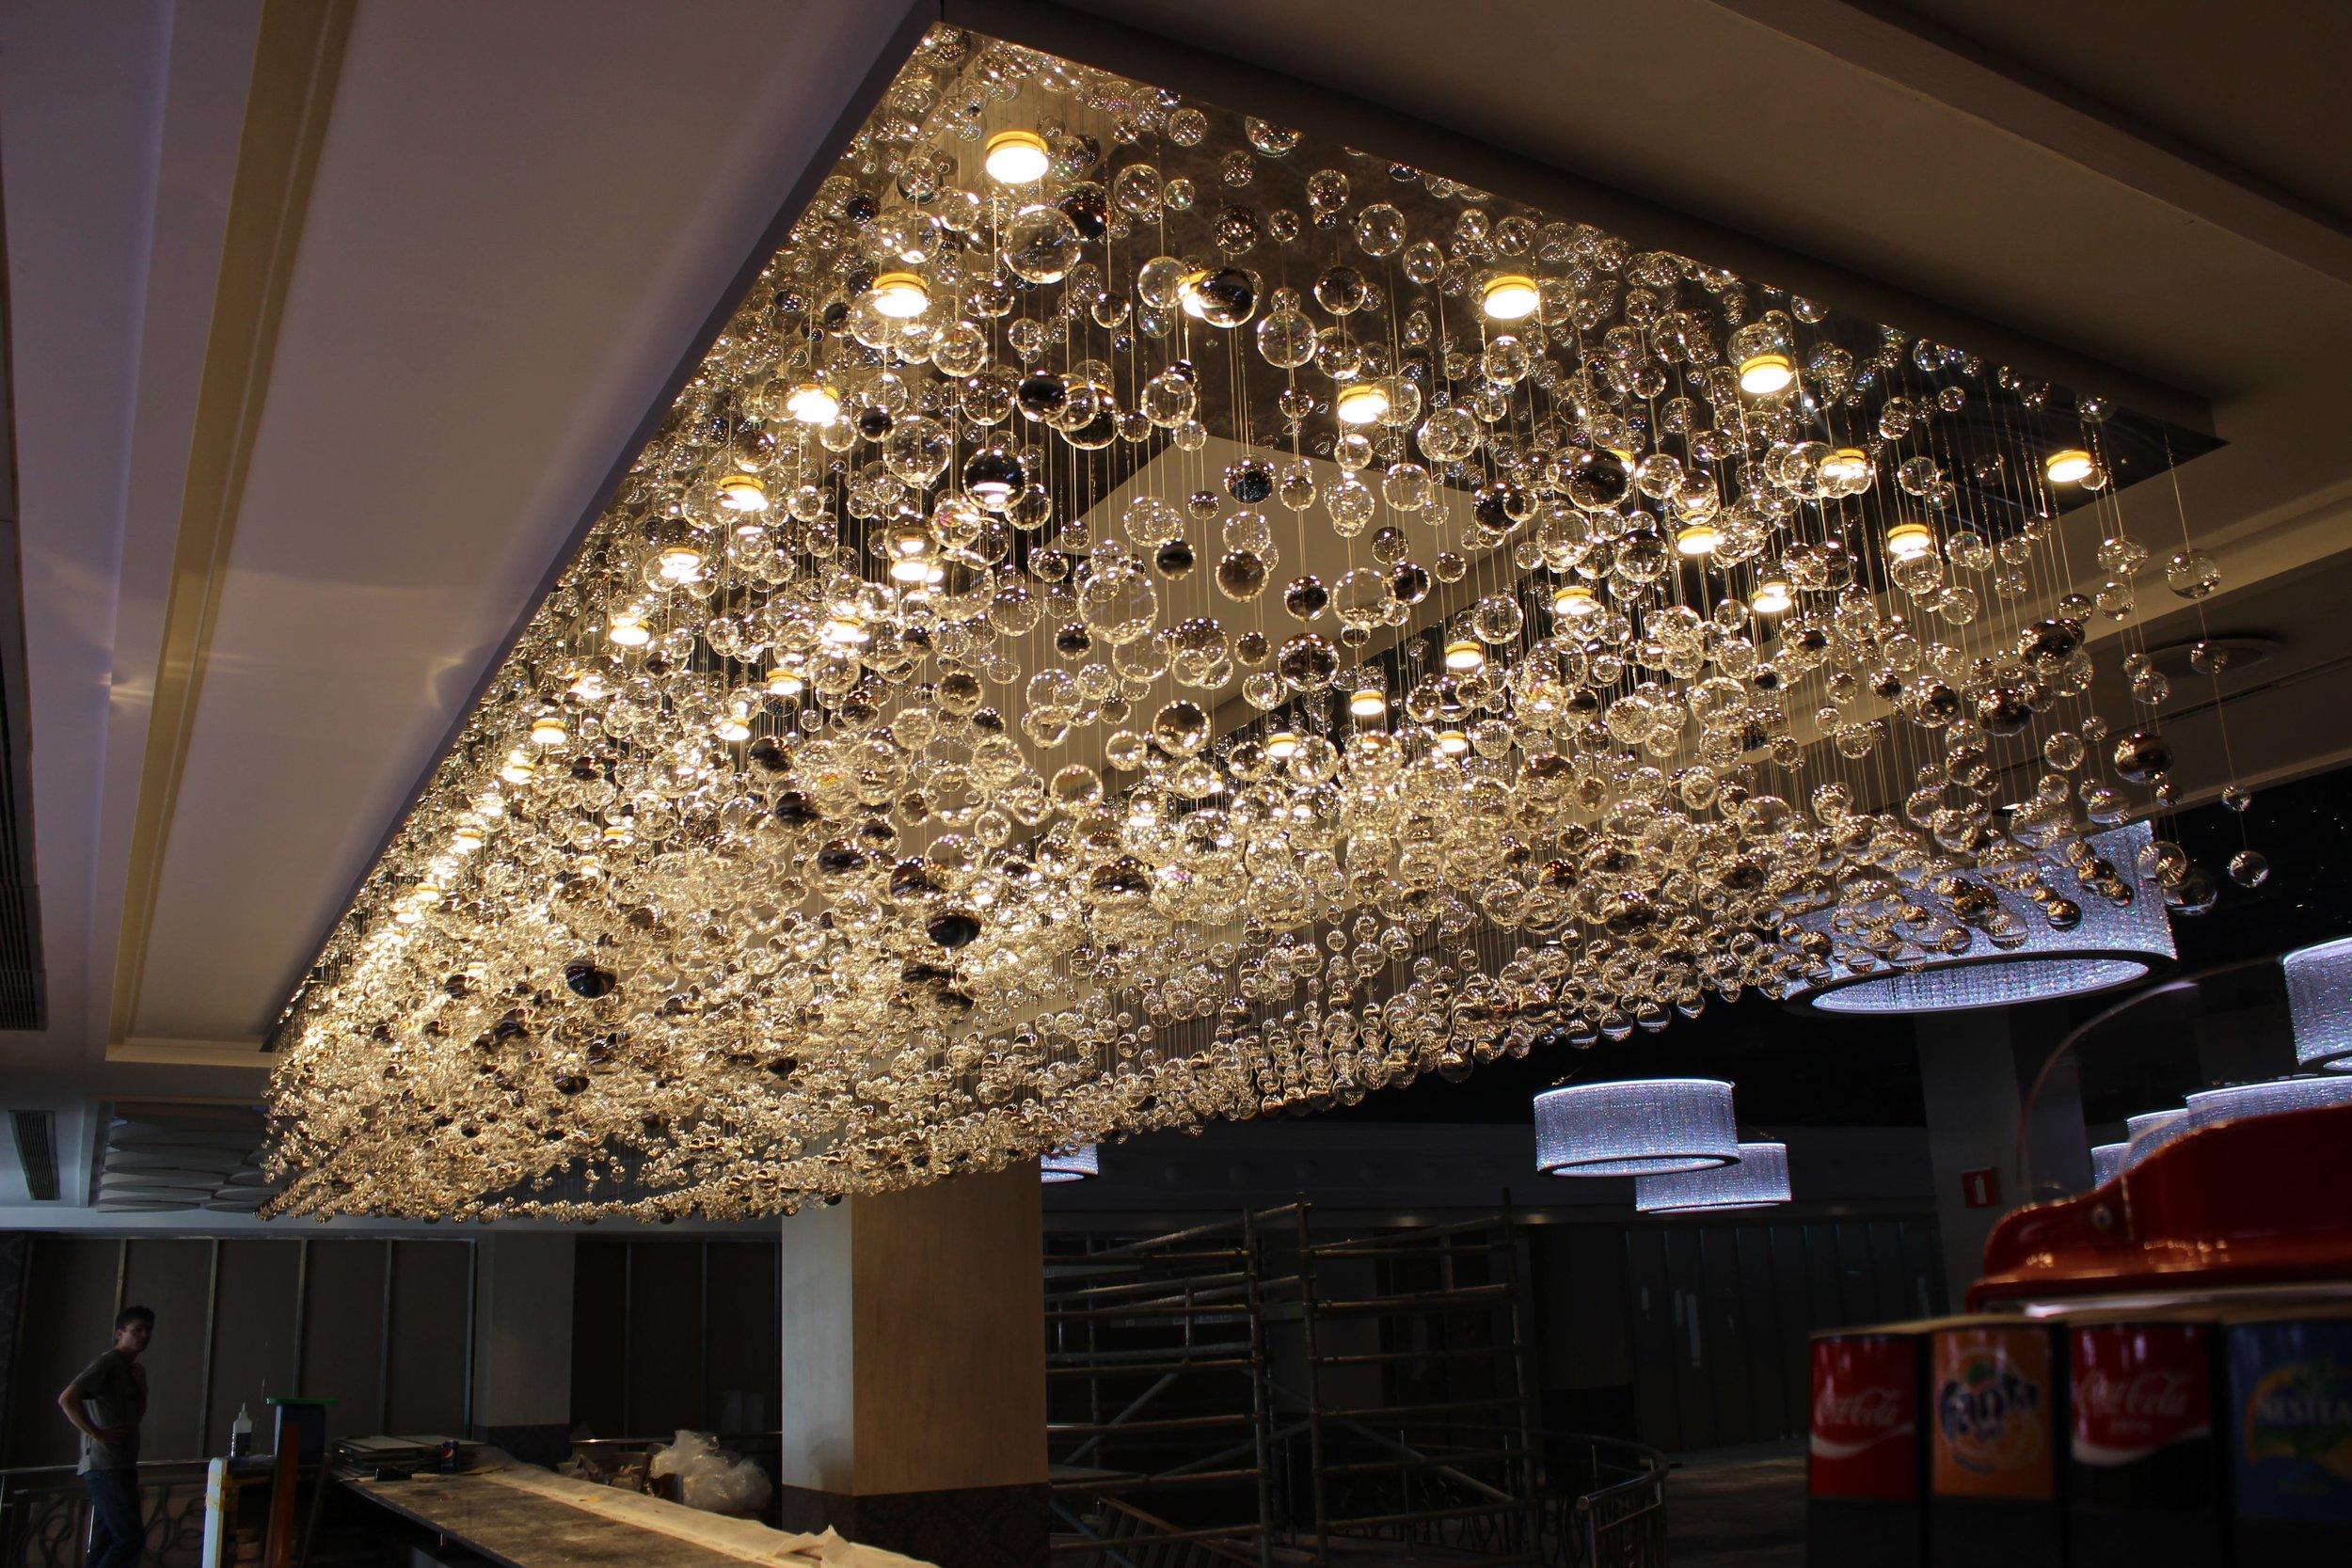 casino-spain-wranovsky-crystal-chandeliers-3.JPG